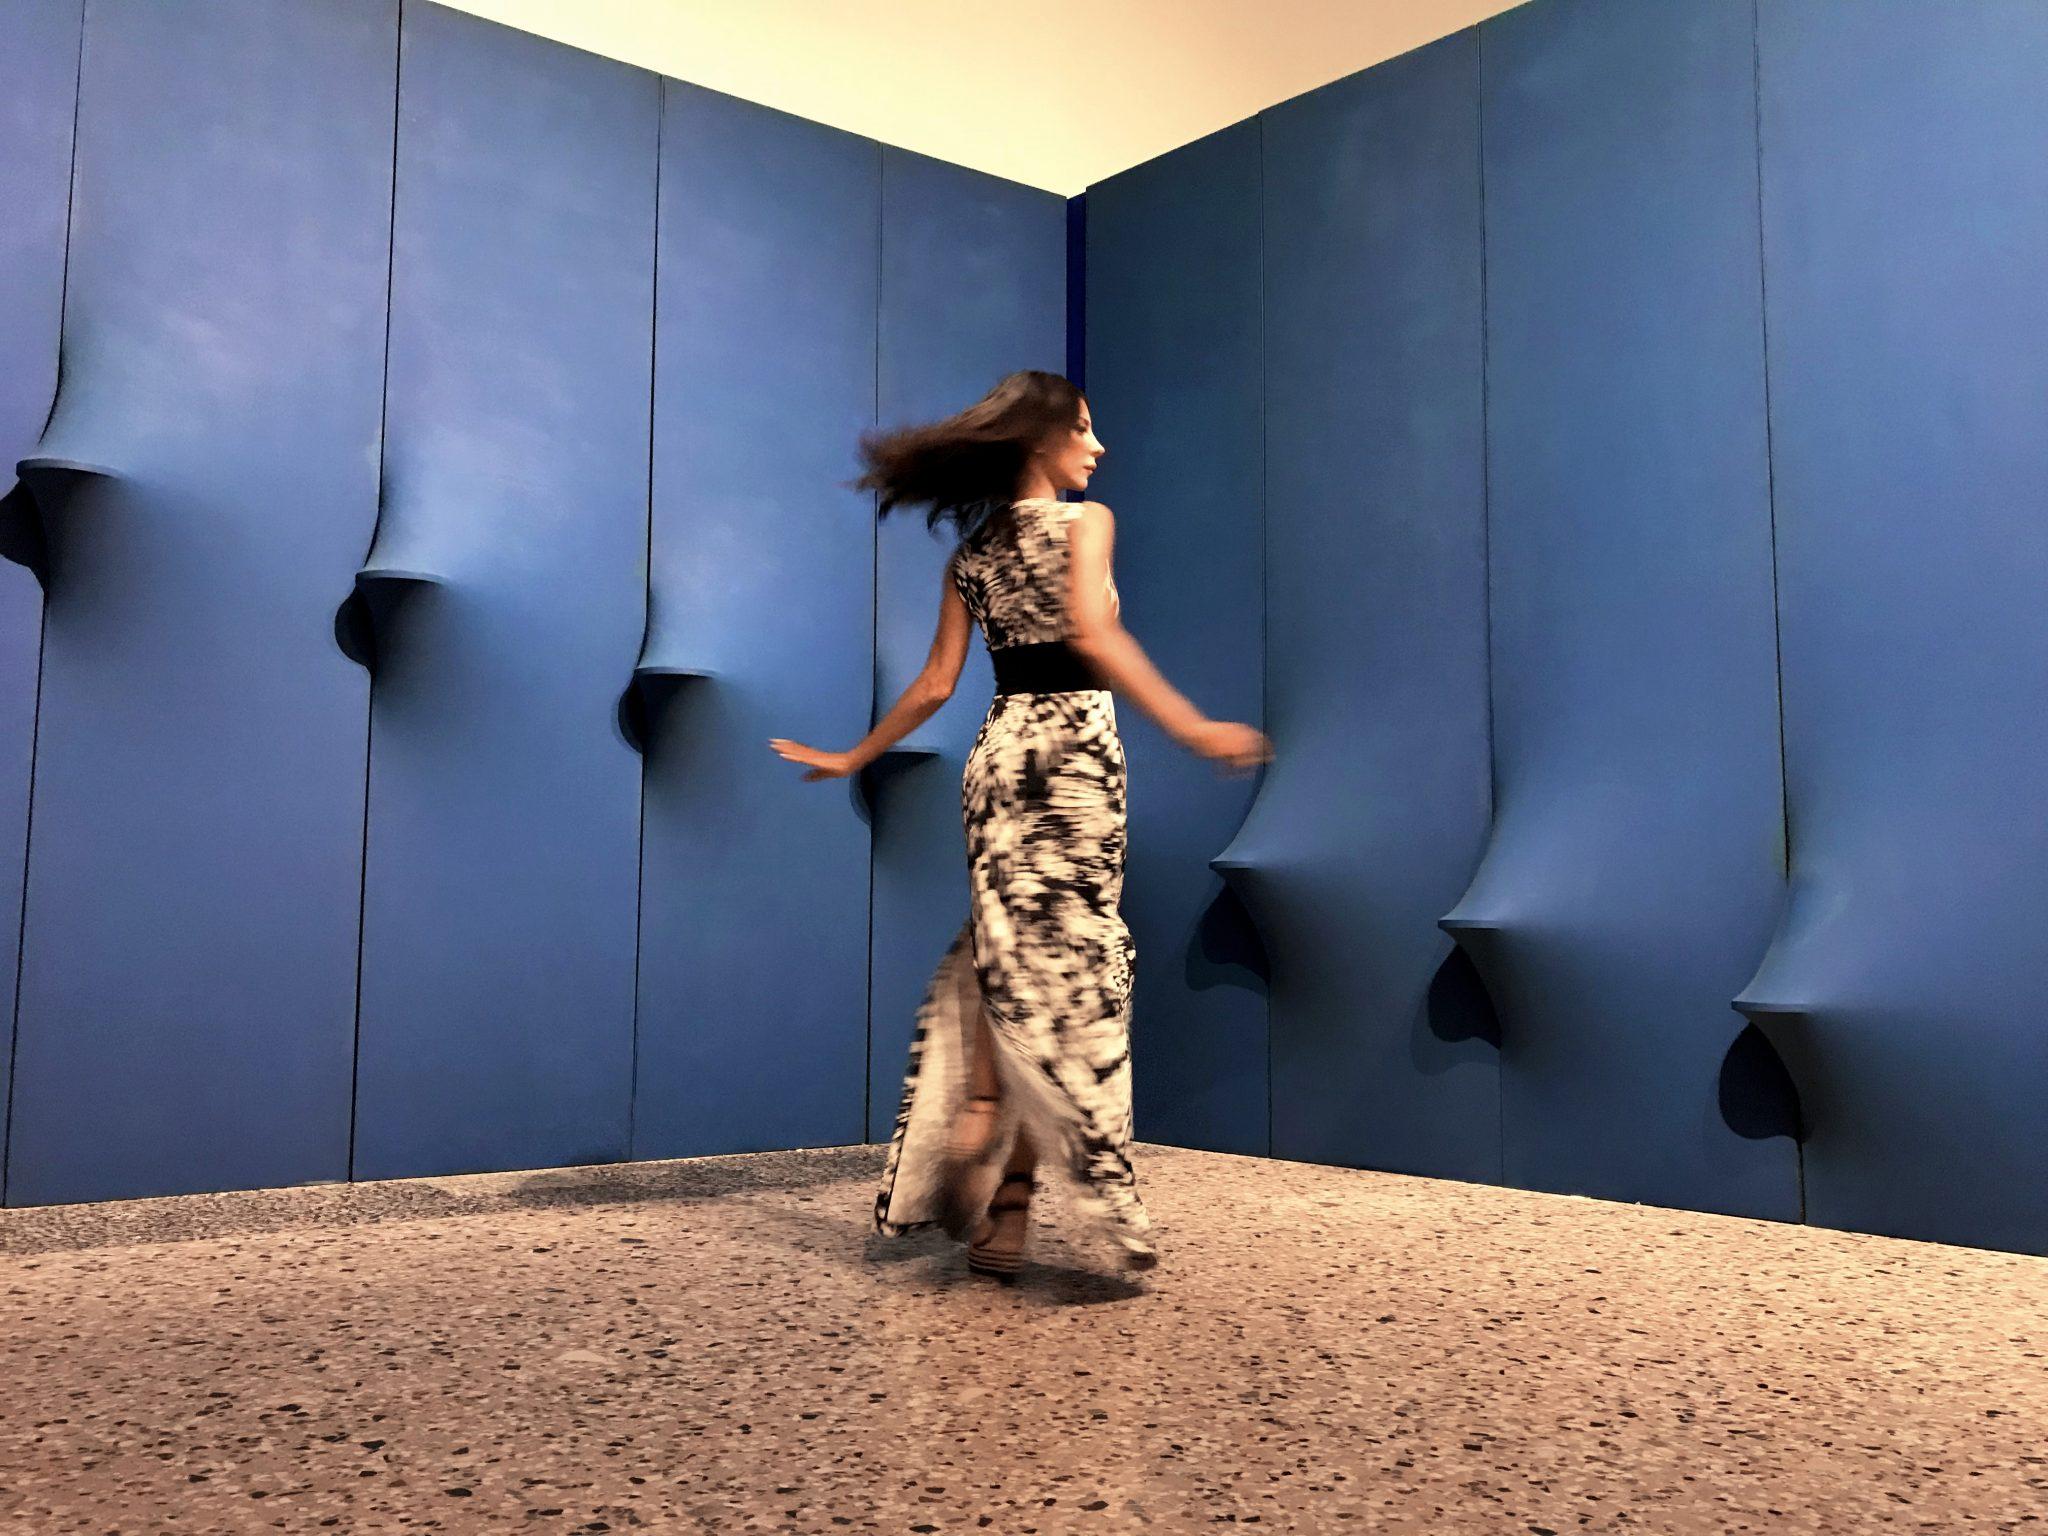 "#SELFIEADARTE ""Come attivare la spunta blu"" @AgostinoBonalumi Blu abitabile, 1967 @PalazzoReale #Milano @CleliaPatella"